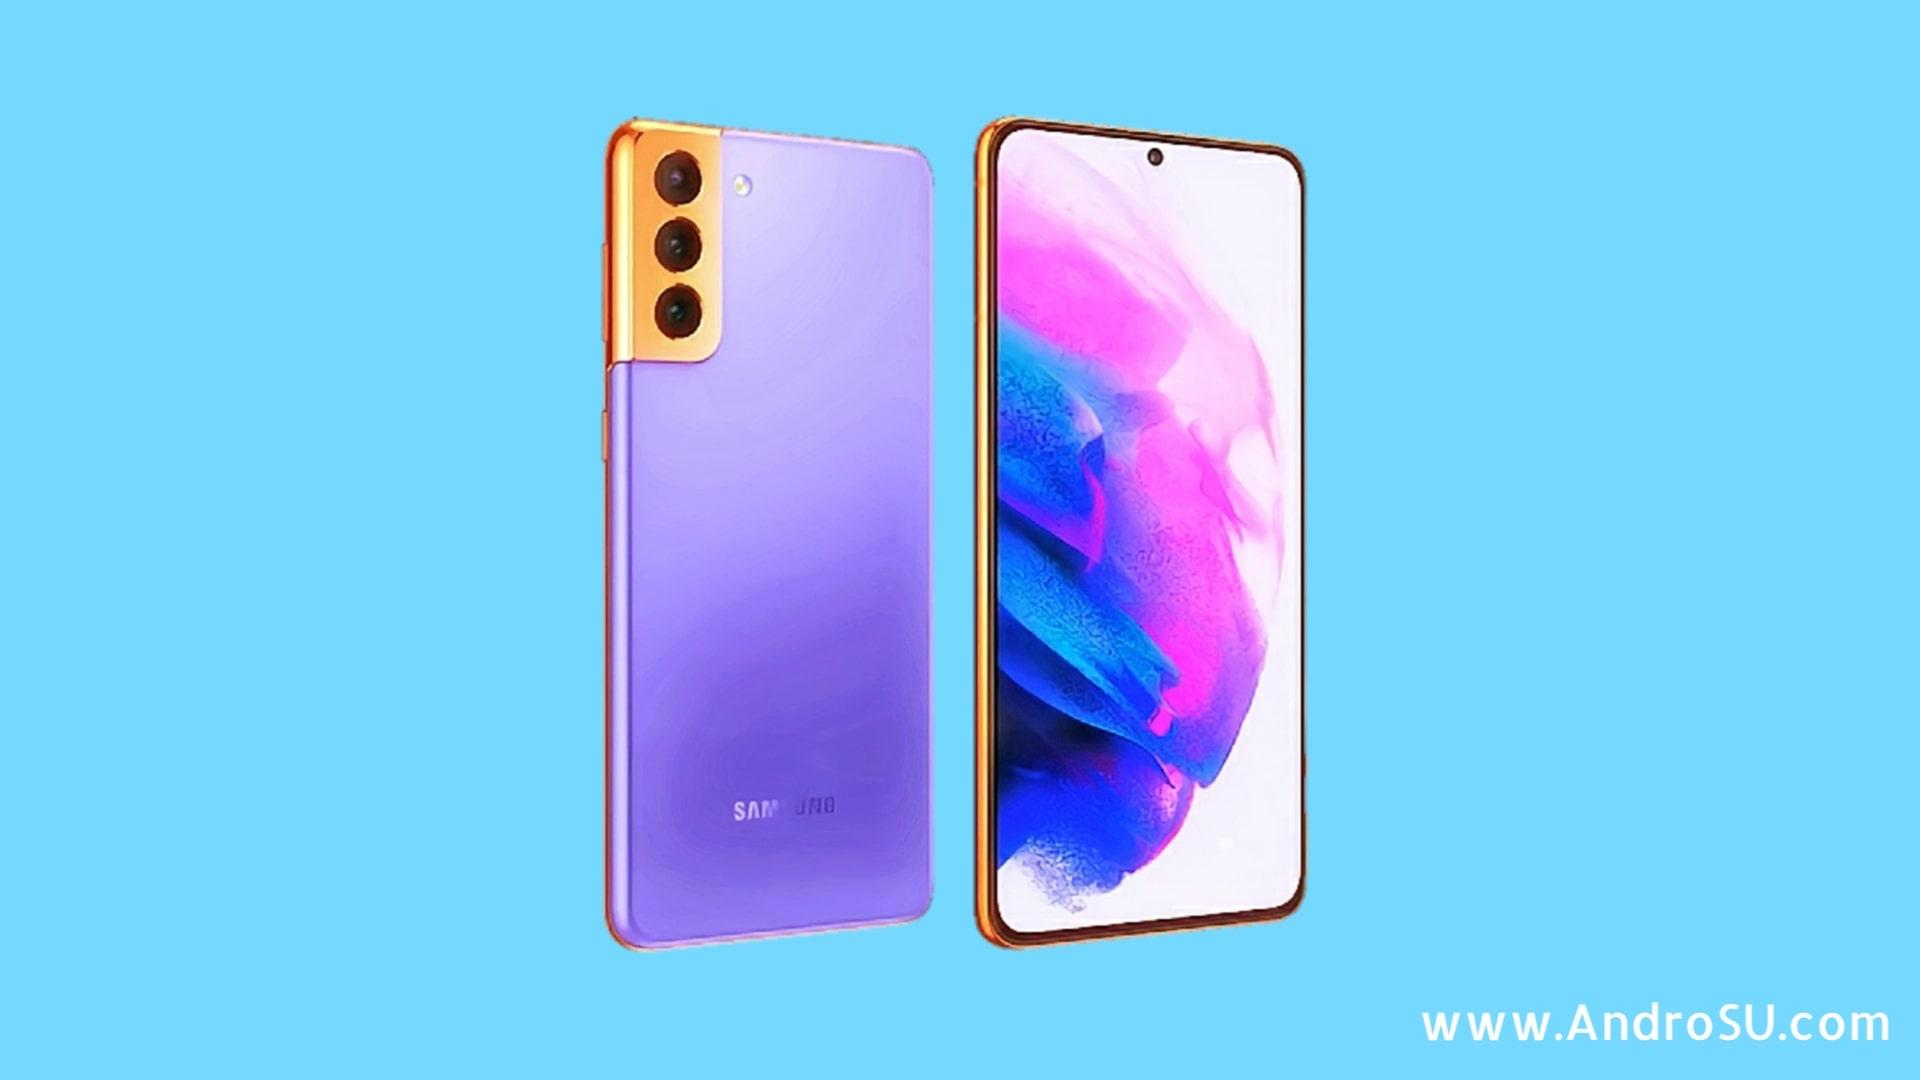 Samsung S21 Phone, Samsung S21 Plus, Samsung S21 Ultra